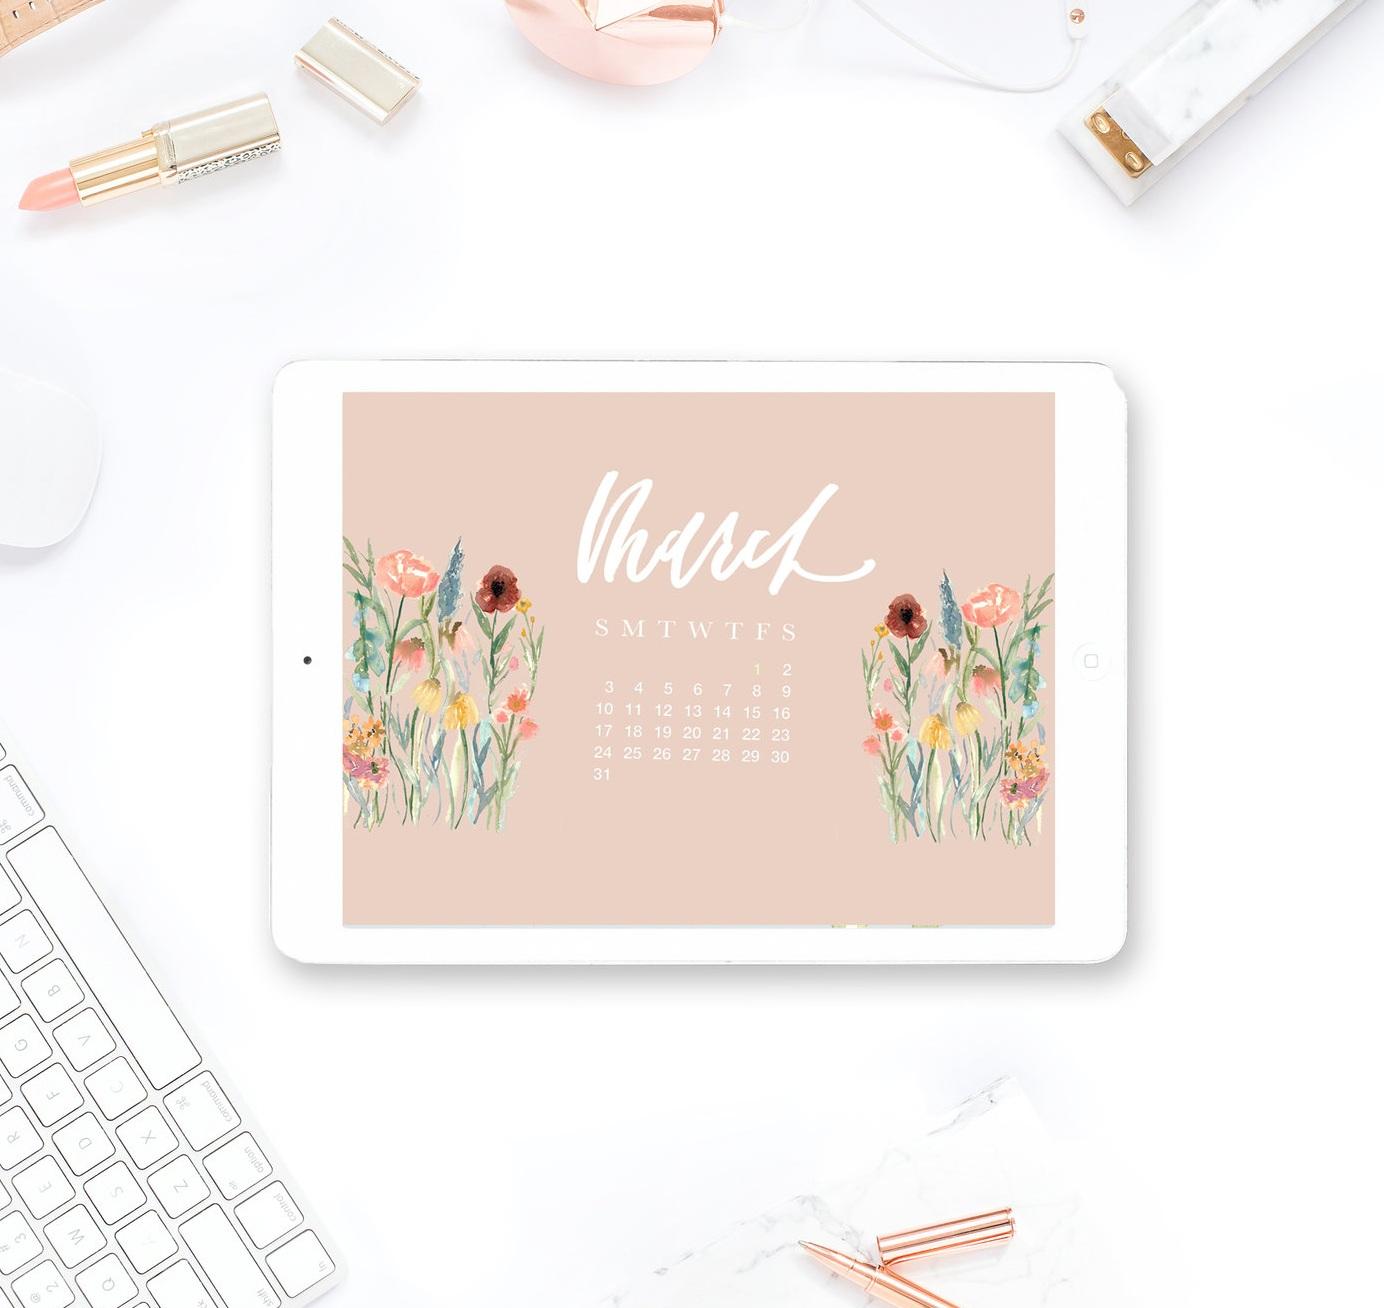 Free-March-2019-Desktop-and-iPhone-Calendar-watercolor-wildflowers-brush-calligraphy-laurenantoniaa